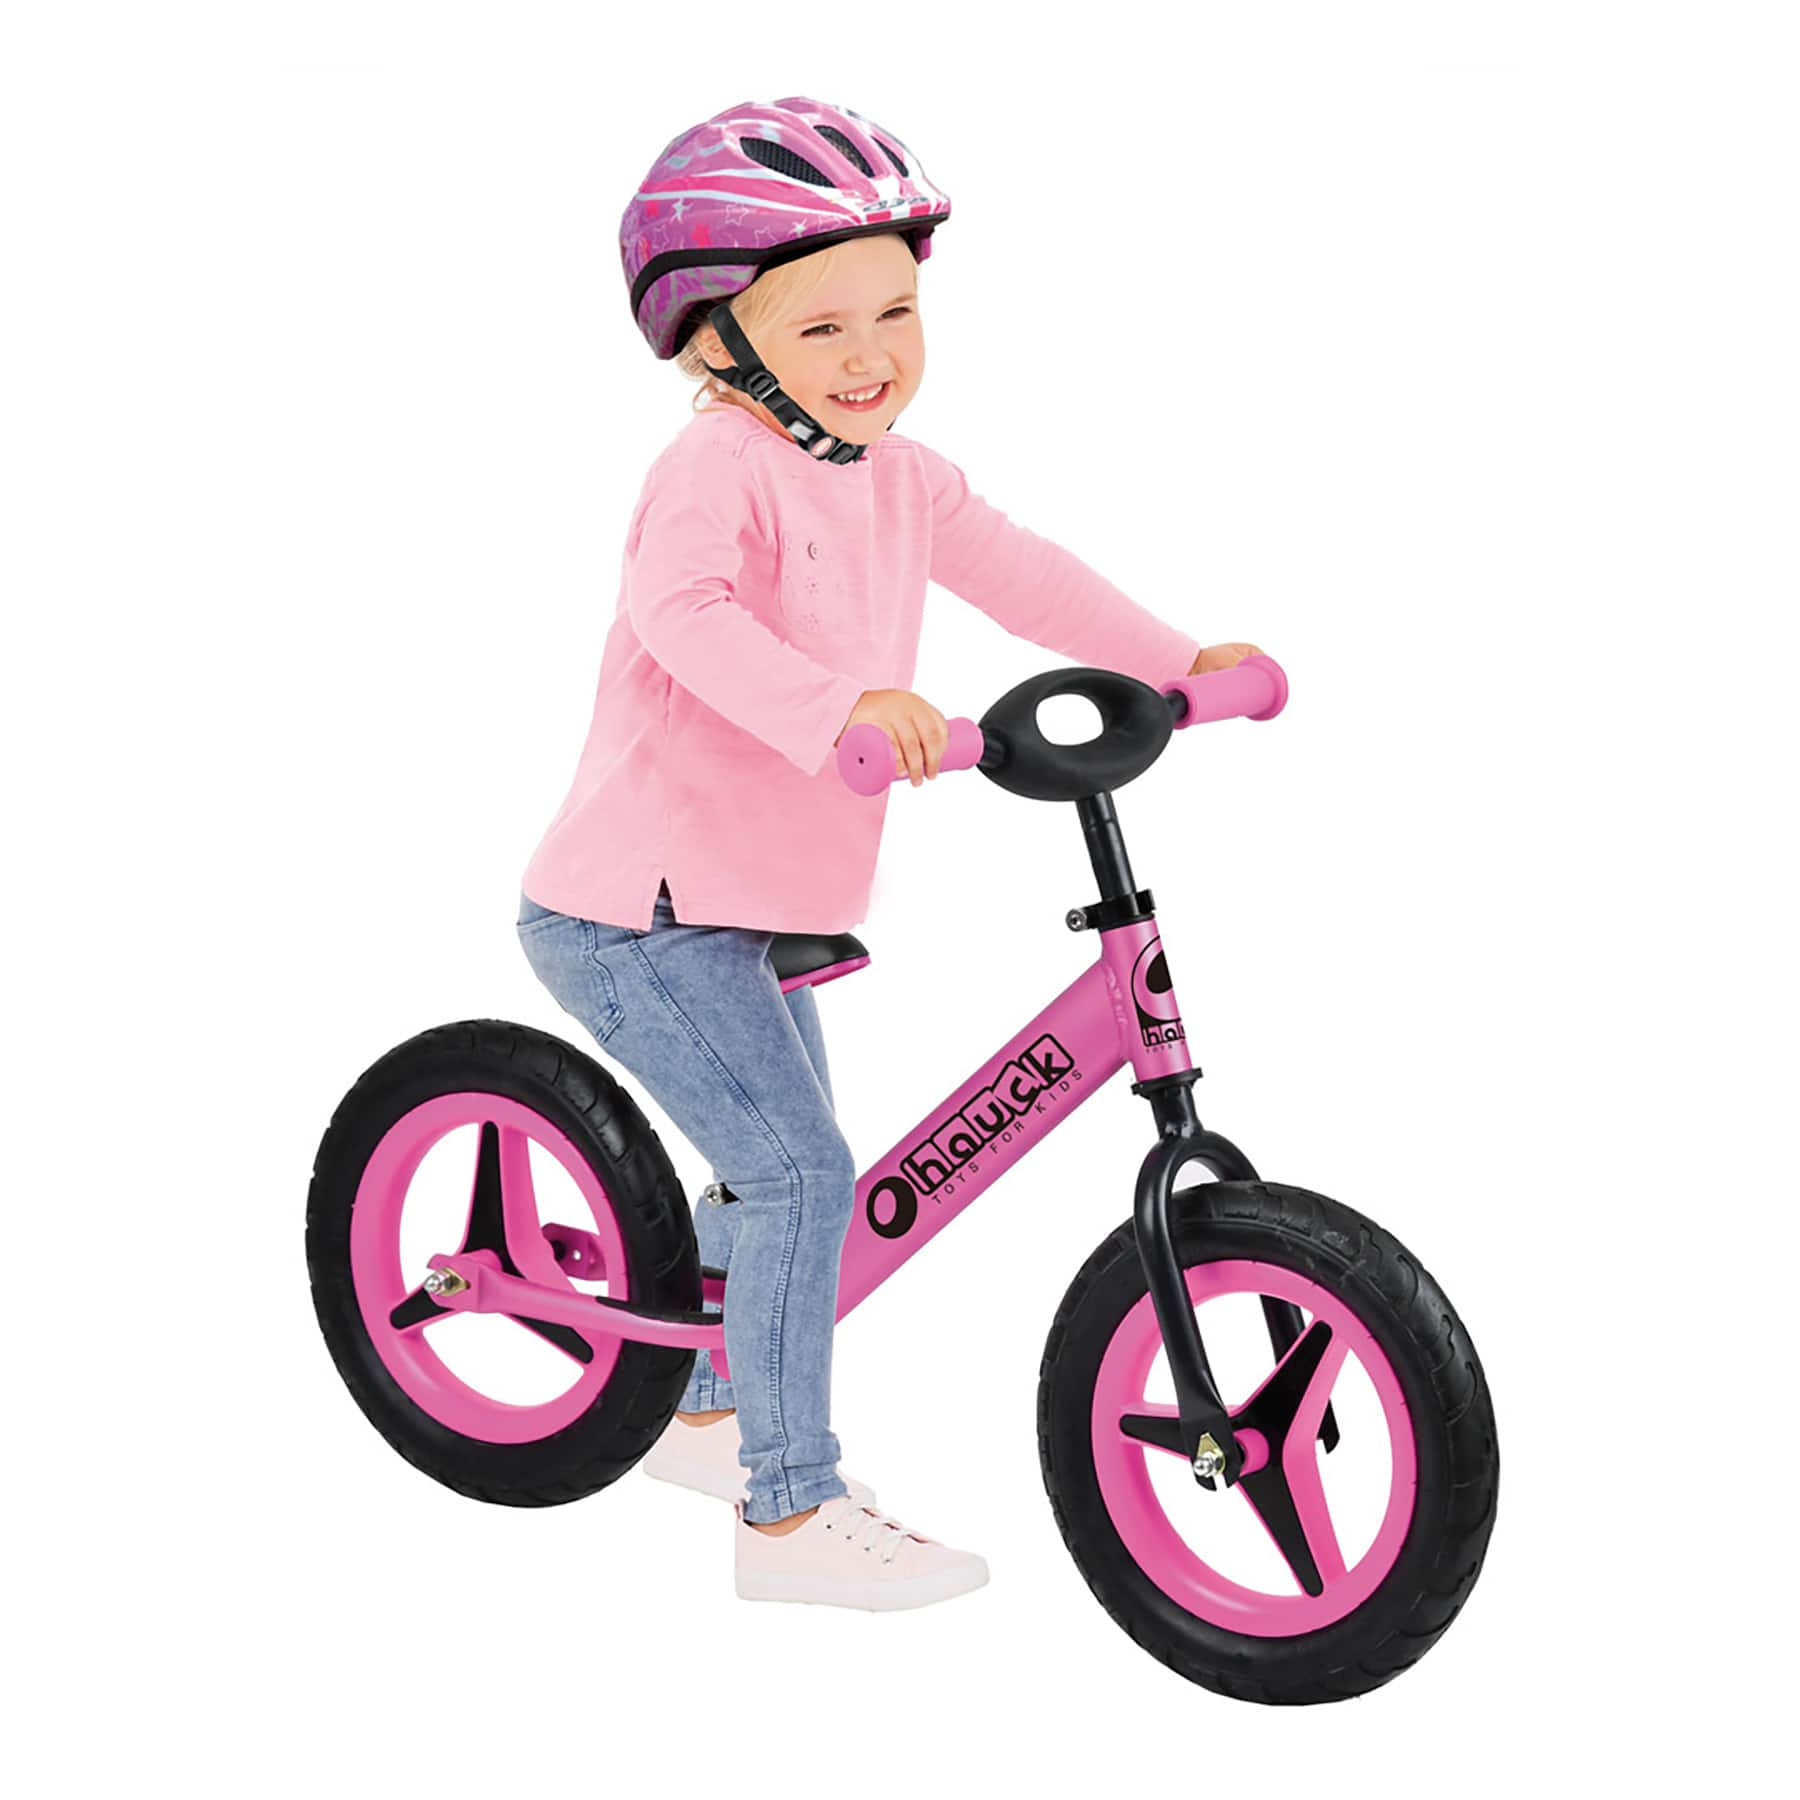 Hauck Aluminum Rider Balance Bike (Pink) $40 + Free Shipping